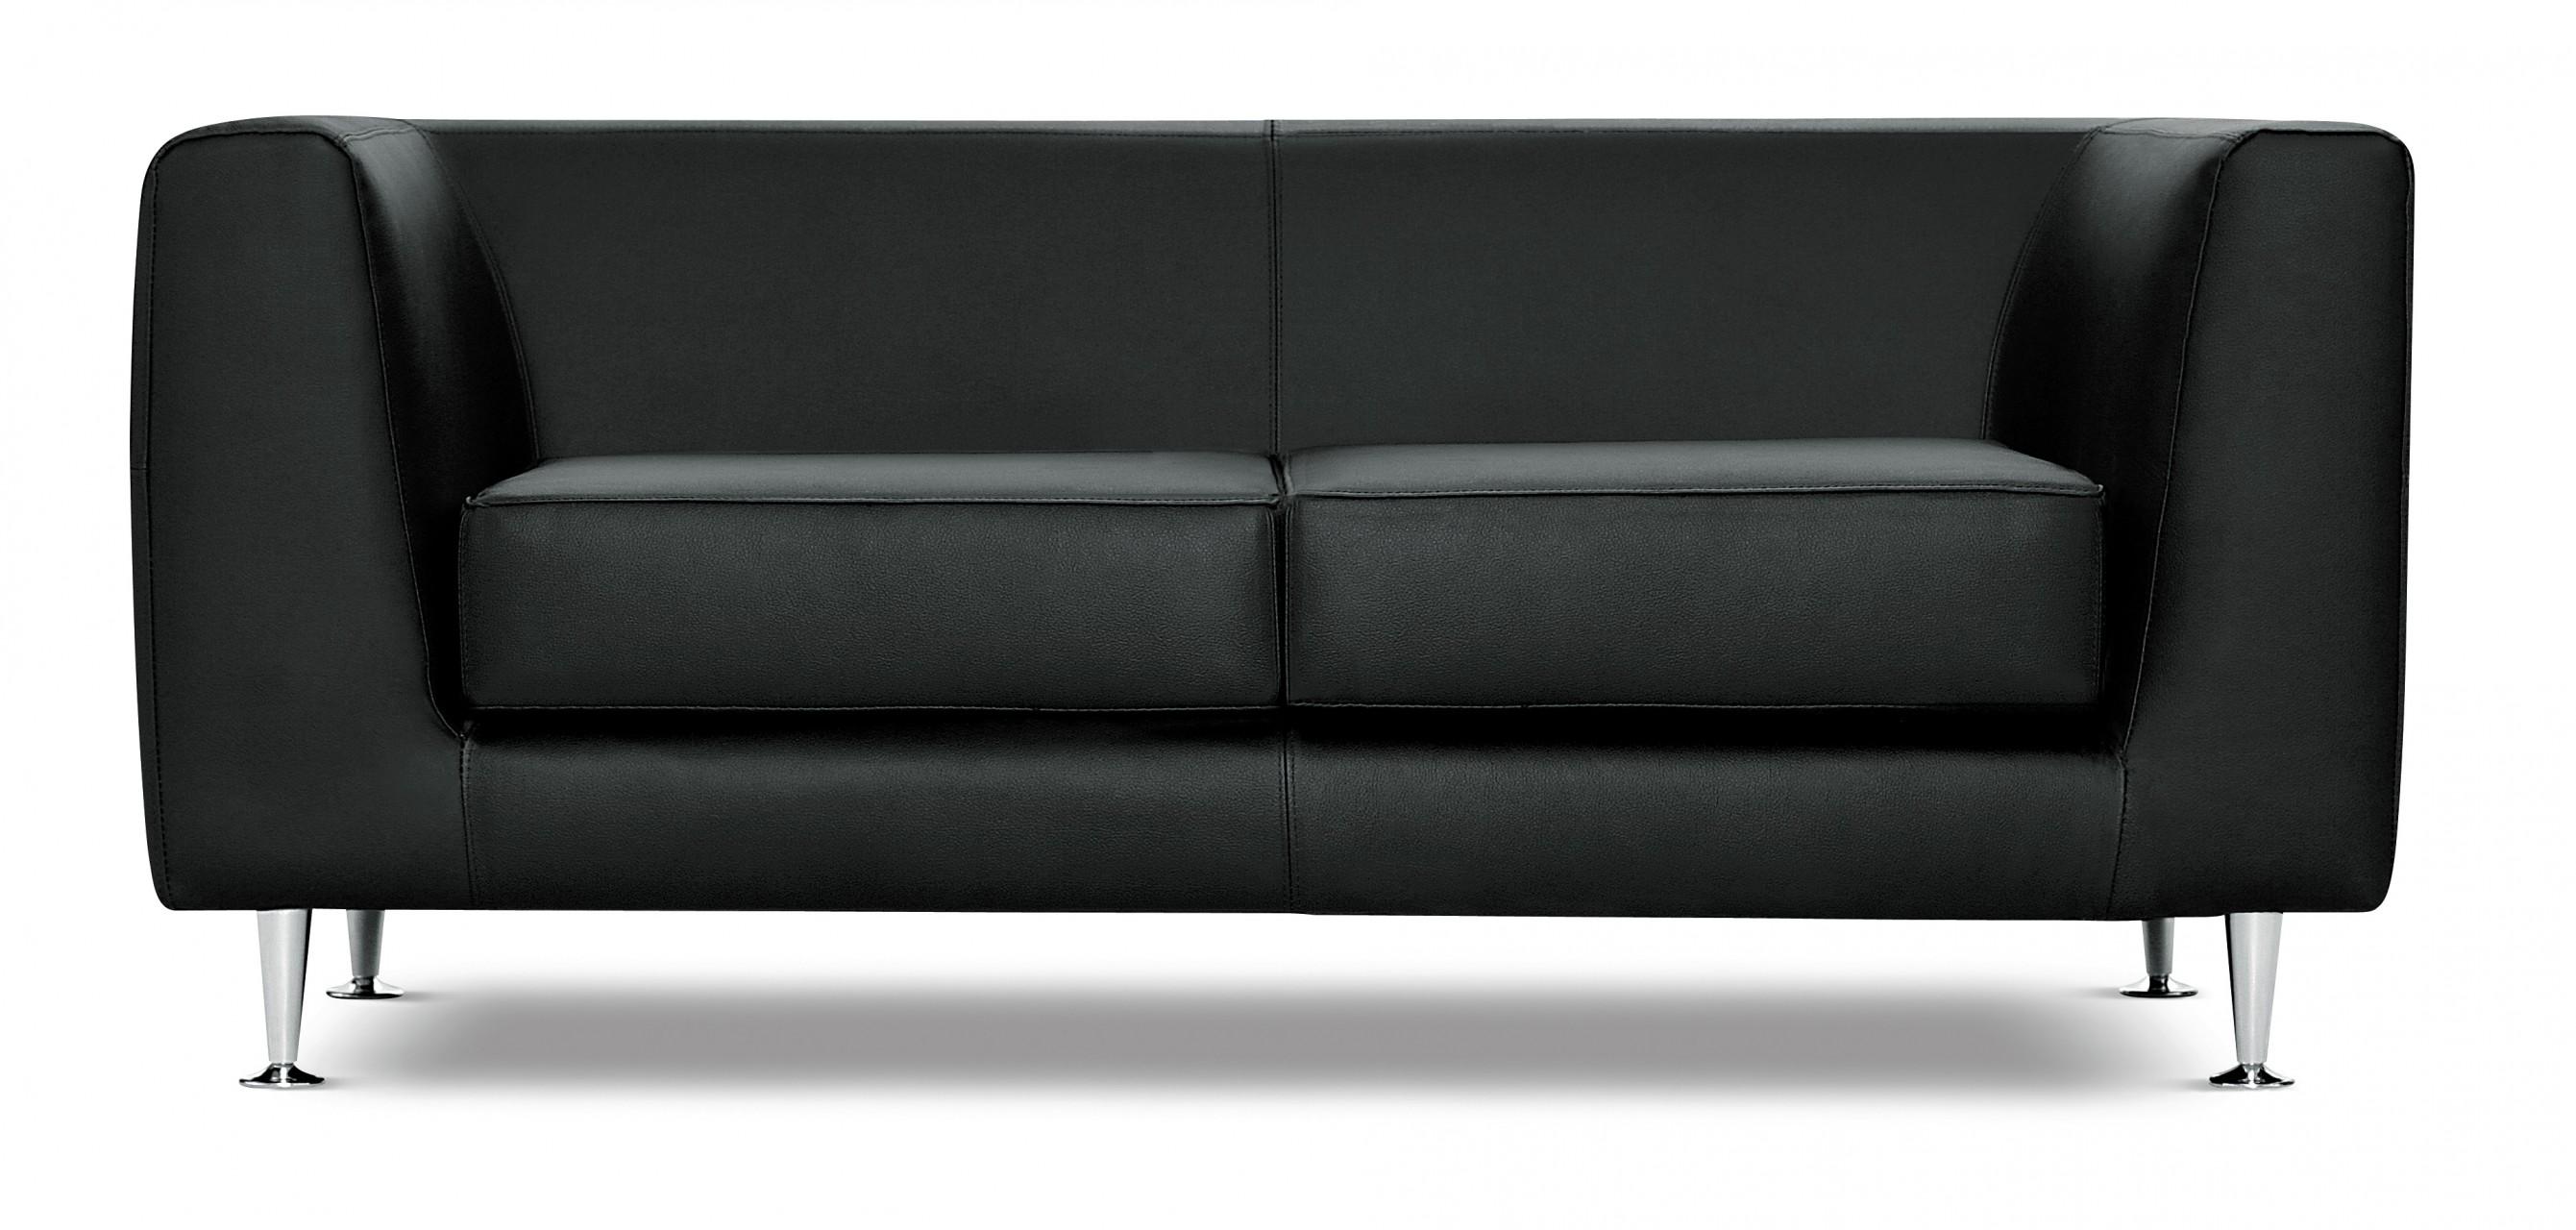 Canap kubo achat fauteuils 759 00 - Canape et fauteuil assorti ...